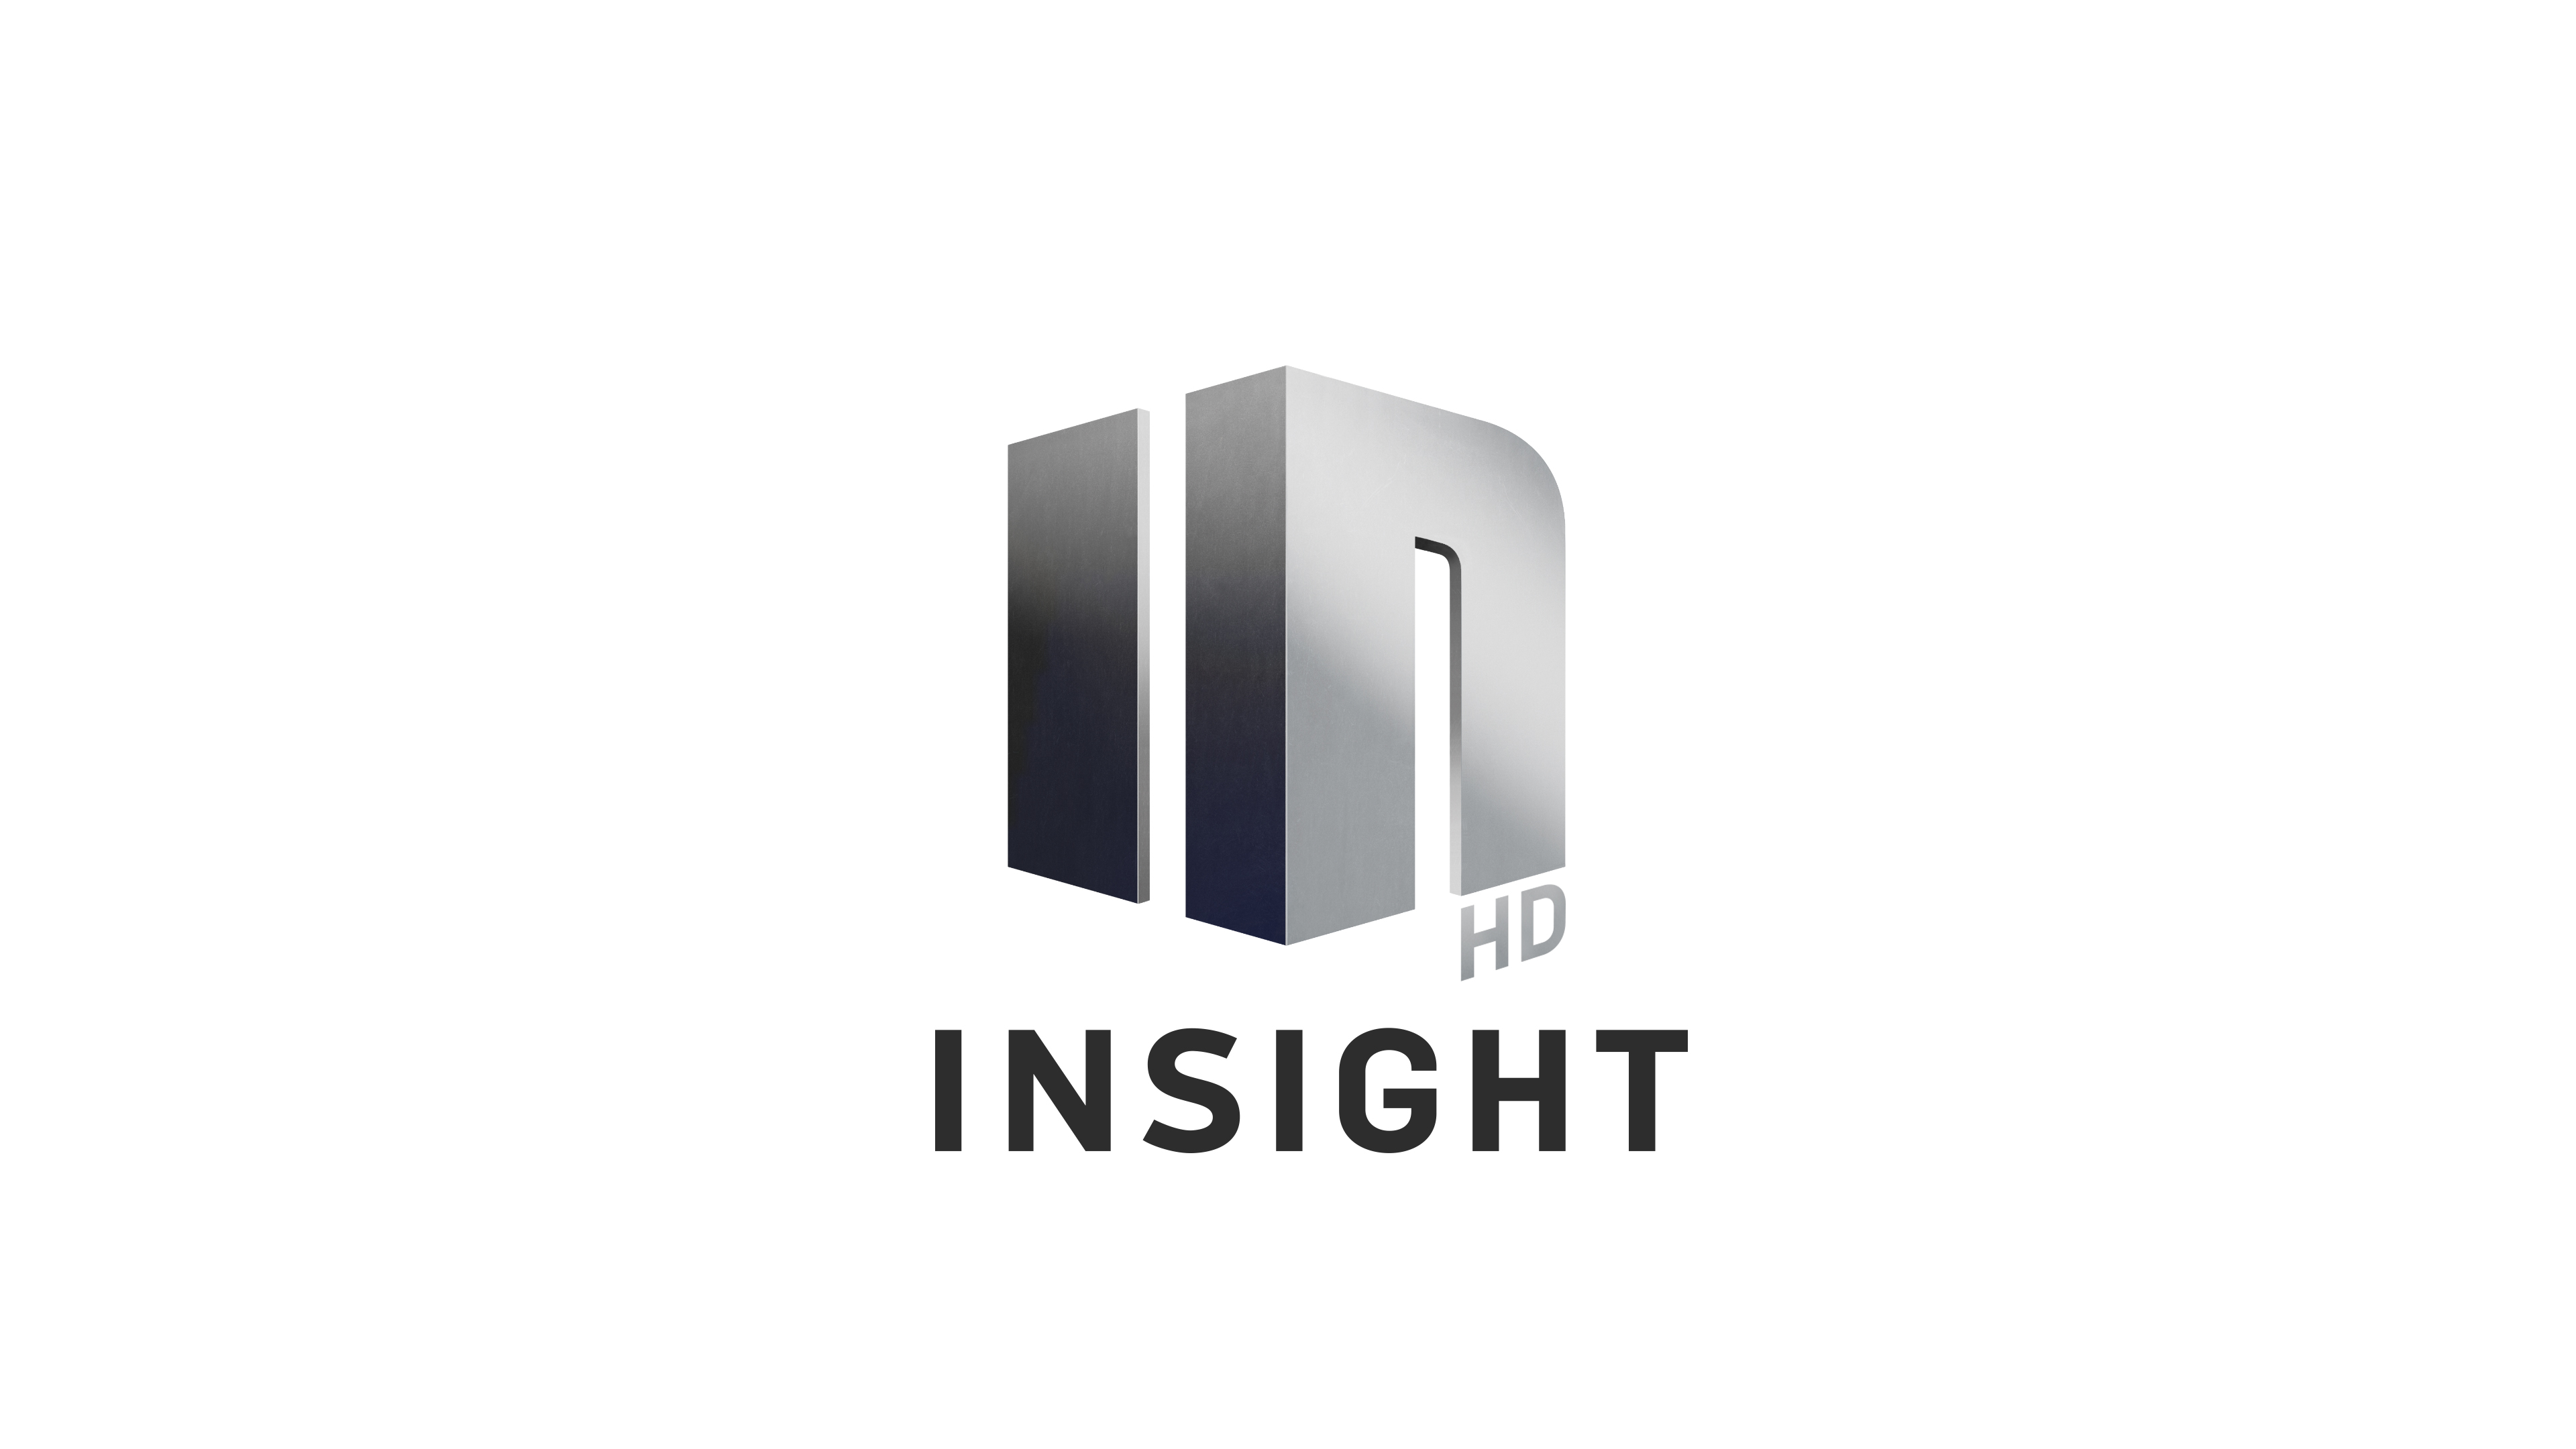 Insight Tv Hd